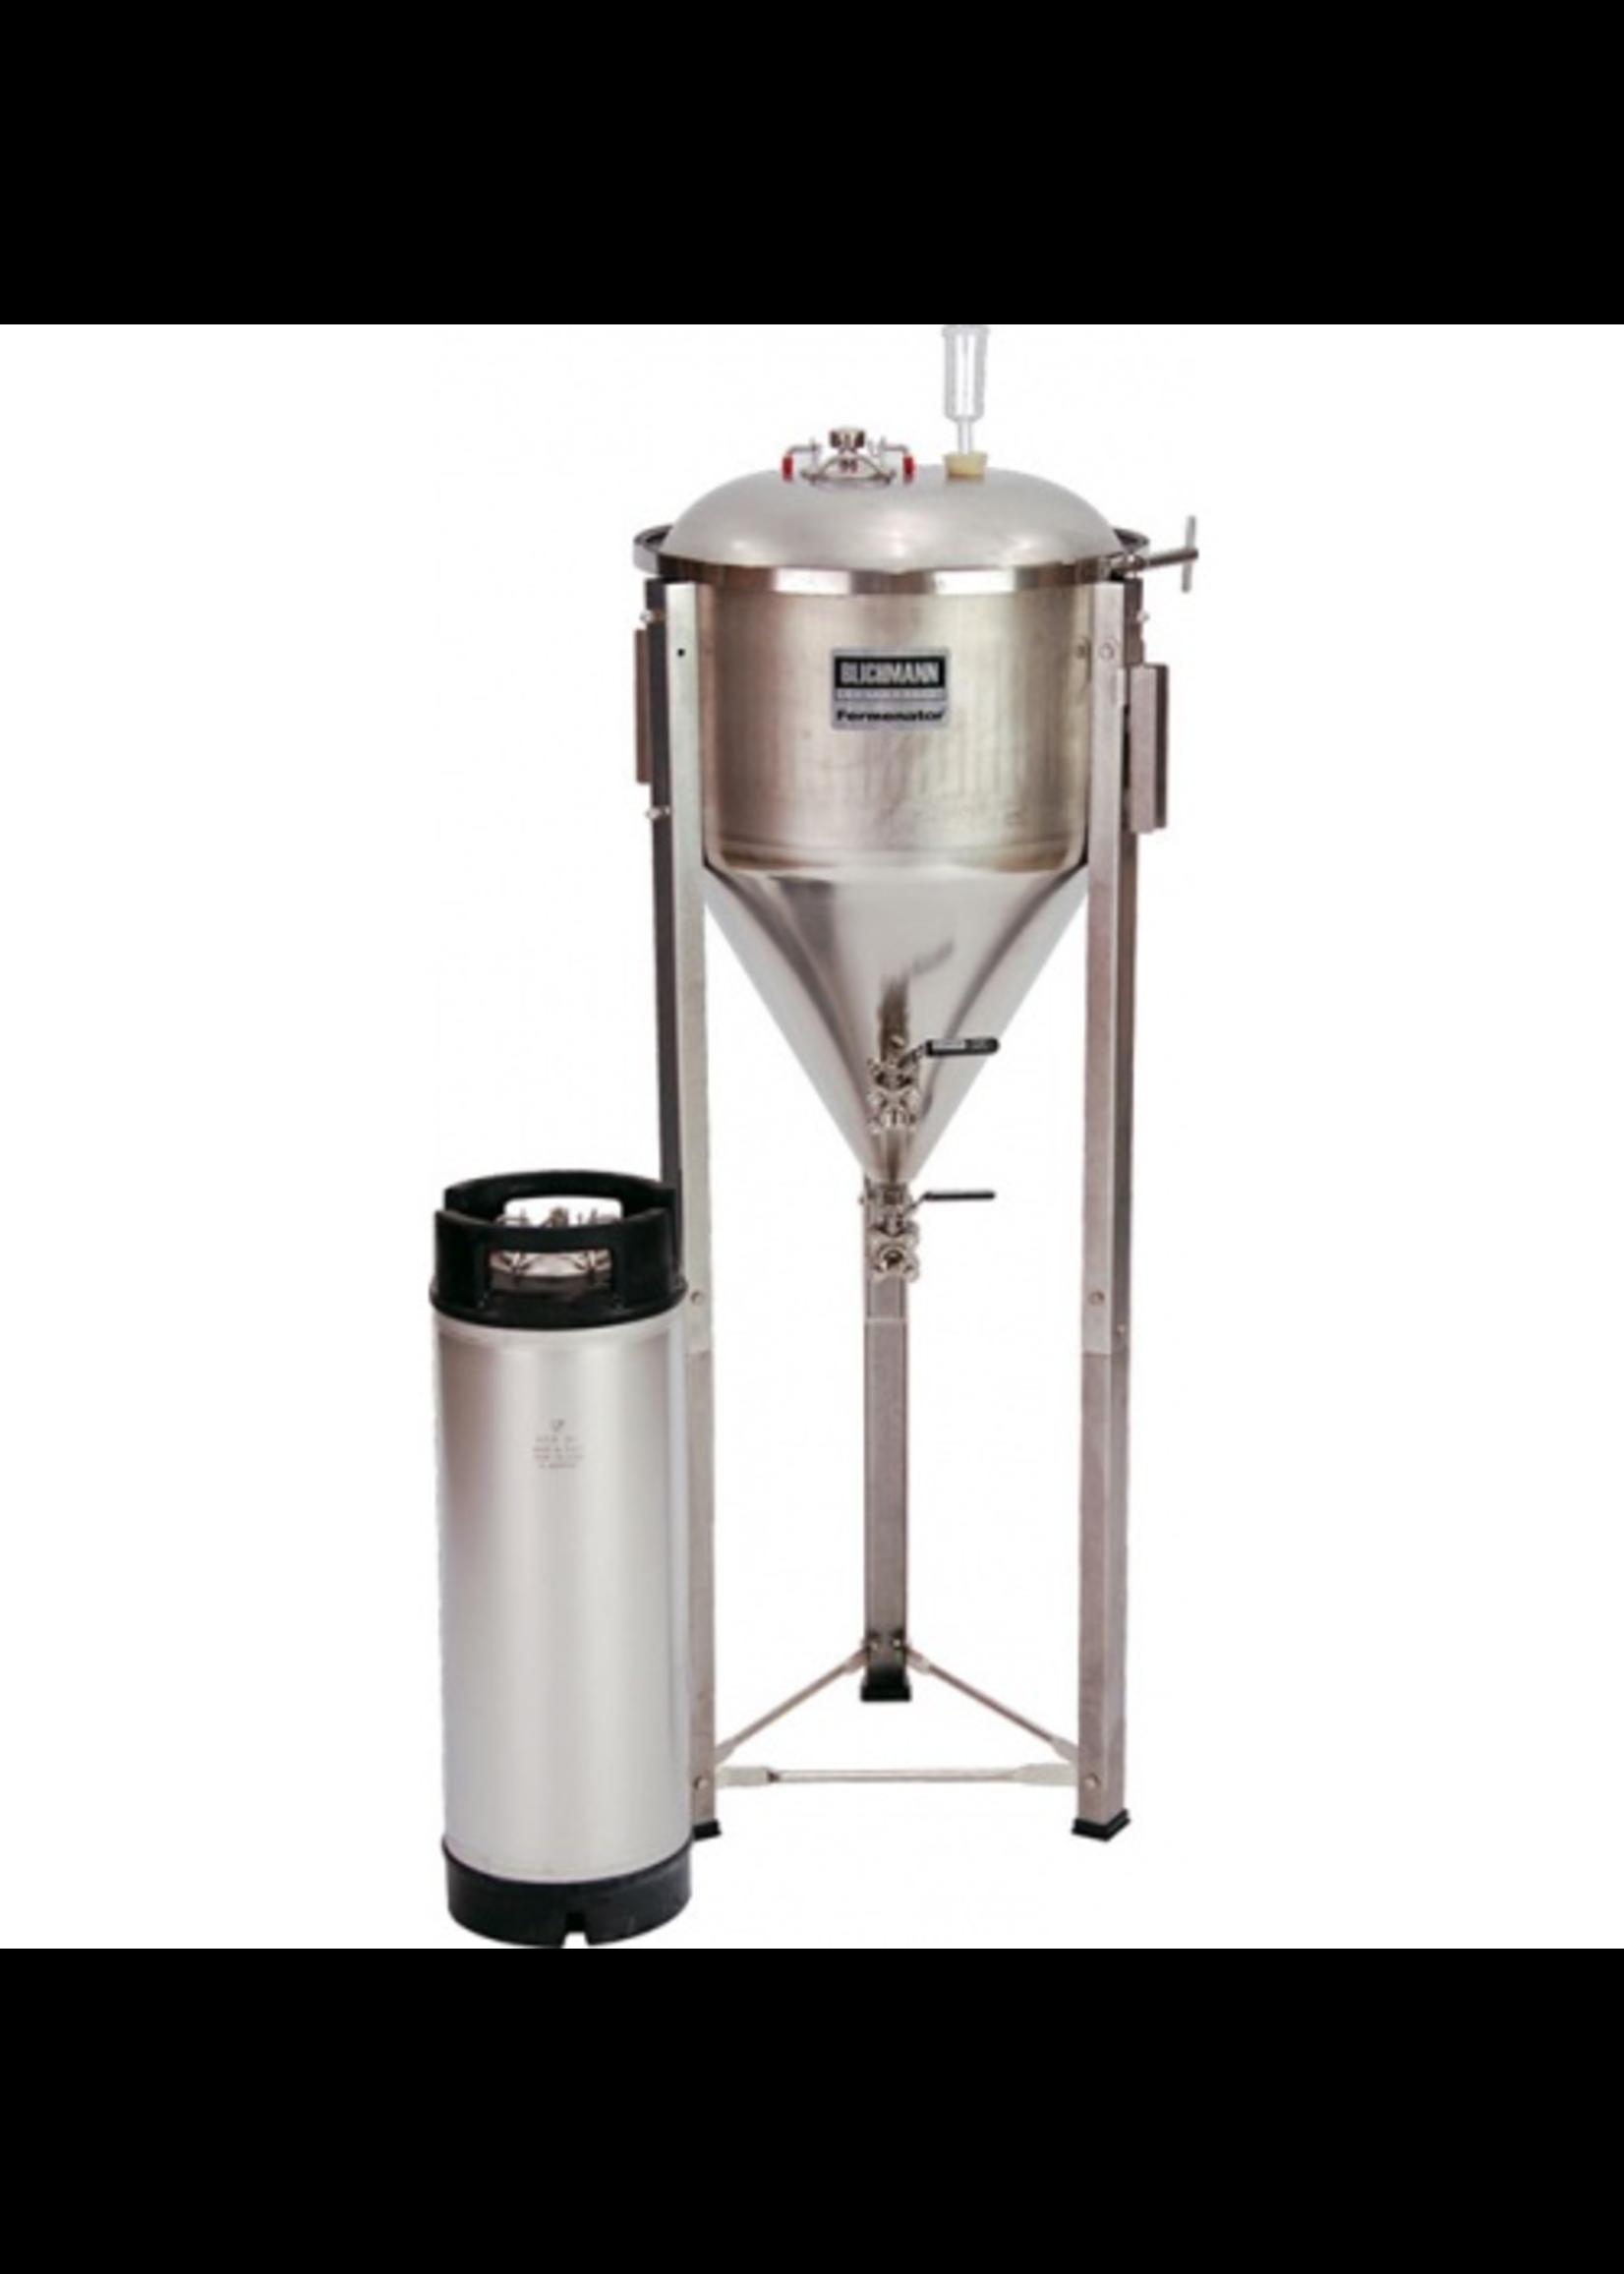 Blichmann Blichmann Fermenator - Leg Extensions for 7 Gallon Conical